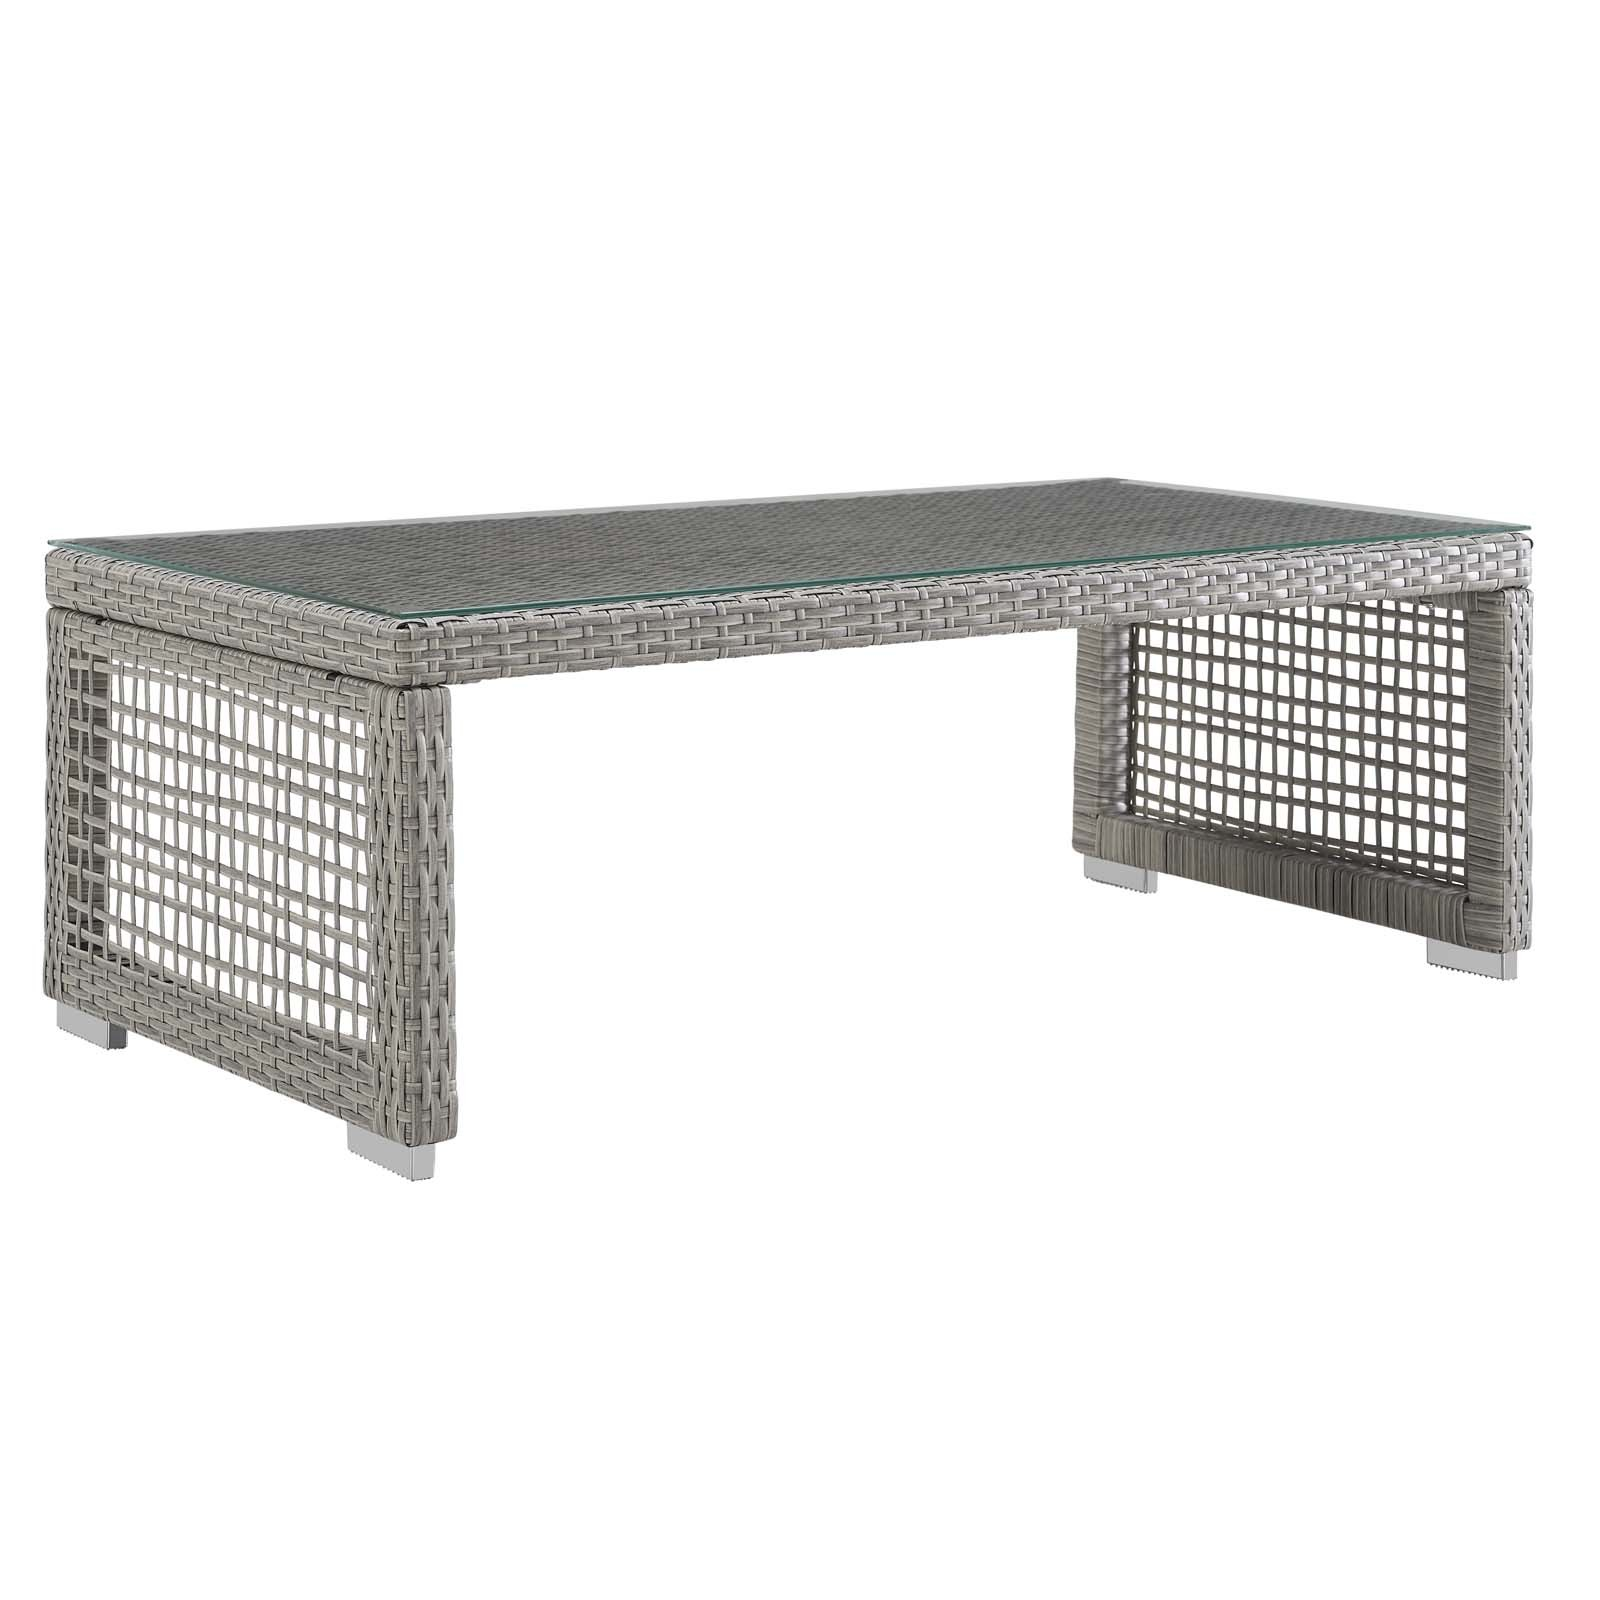 Aura Rattan Outdoor Patio Coffee Table in Gray